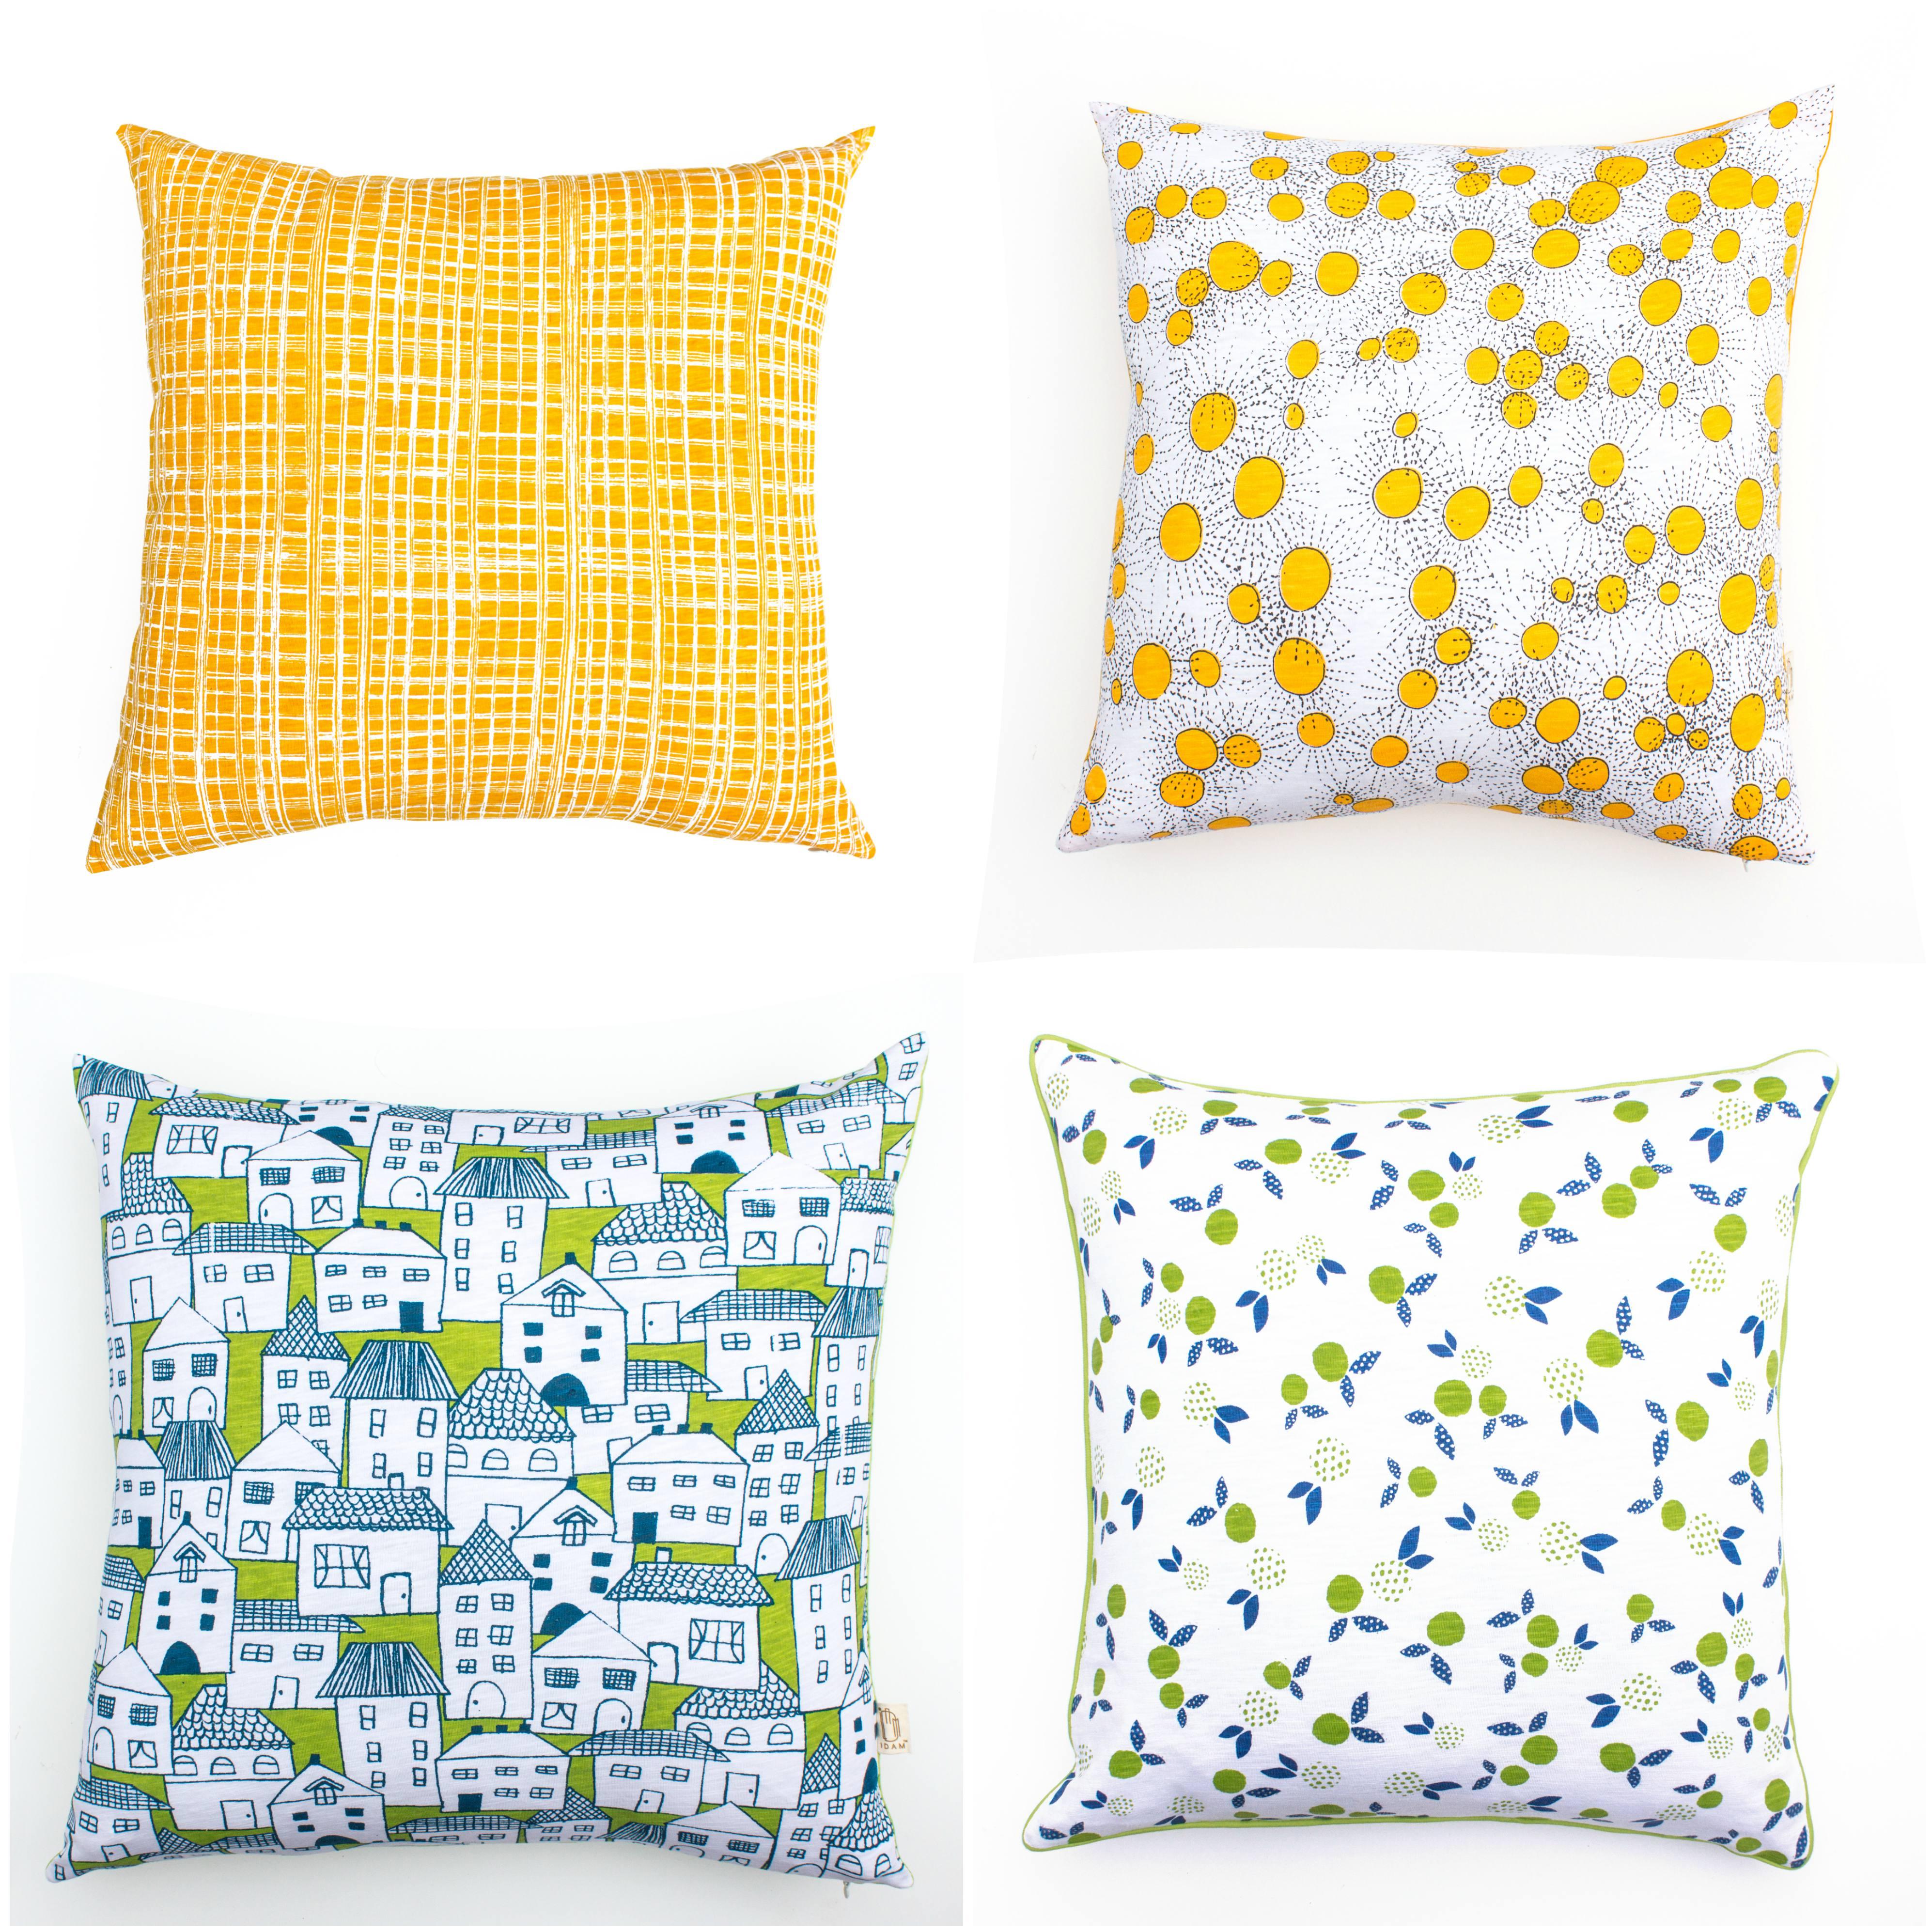 Idam Cushions